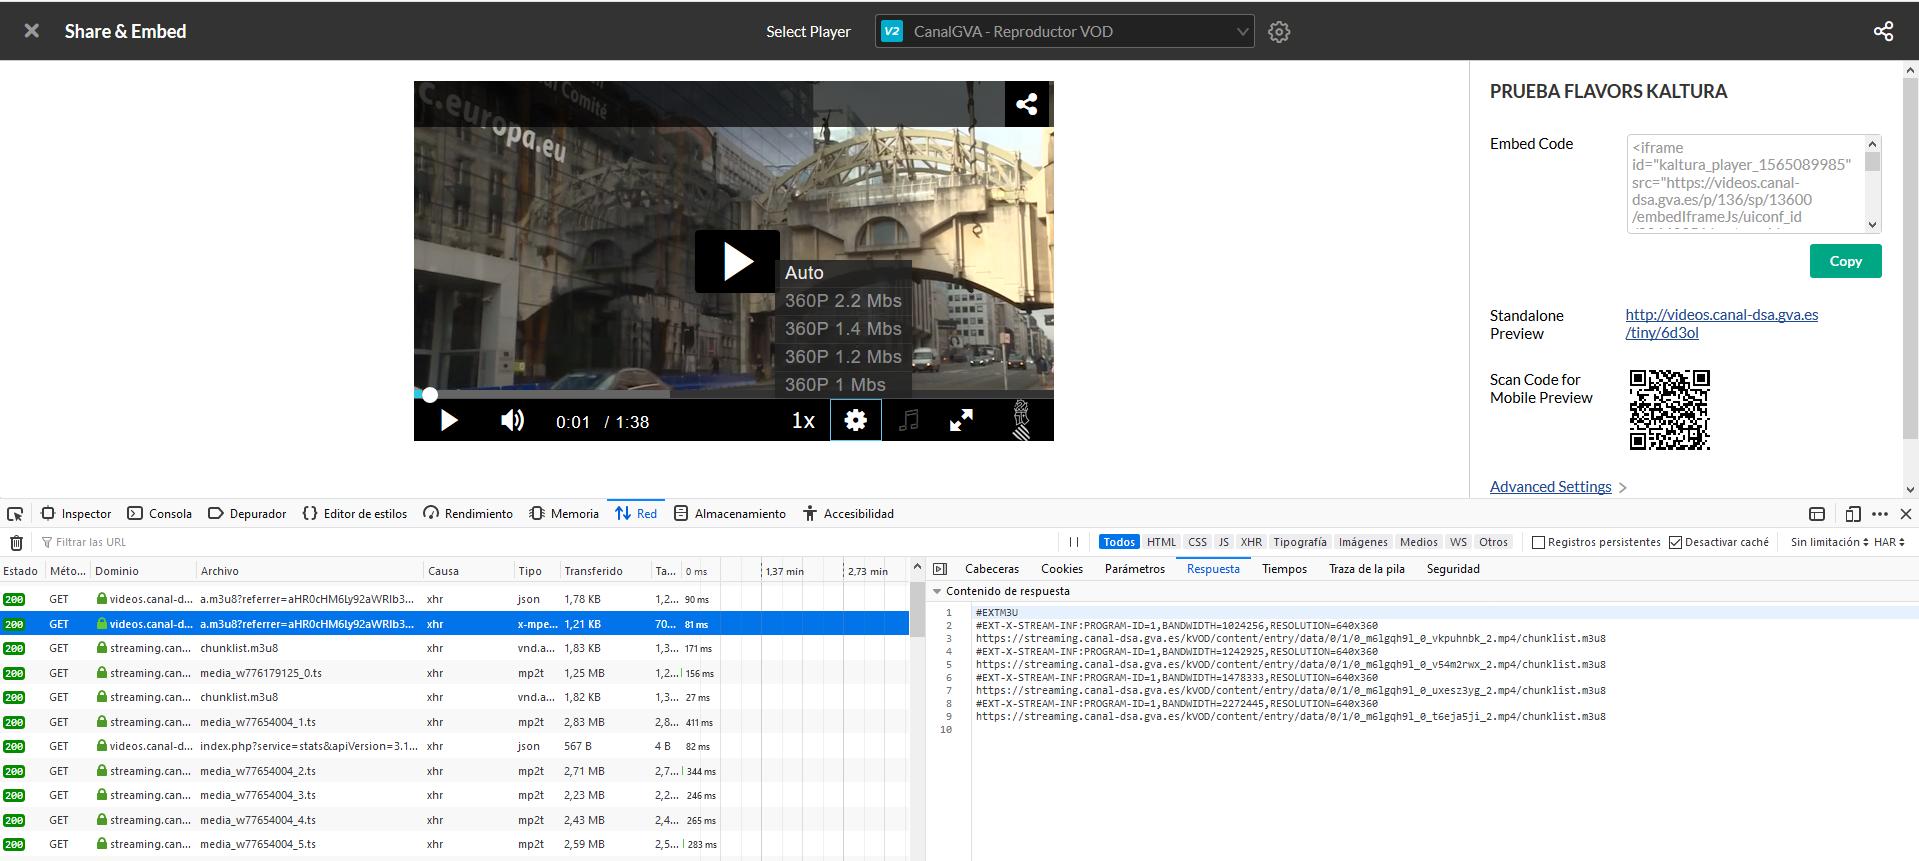 Requesting HLS video url from KALTURA - Backend Server